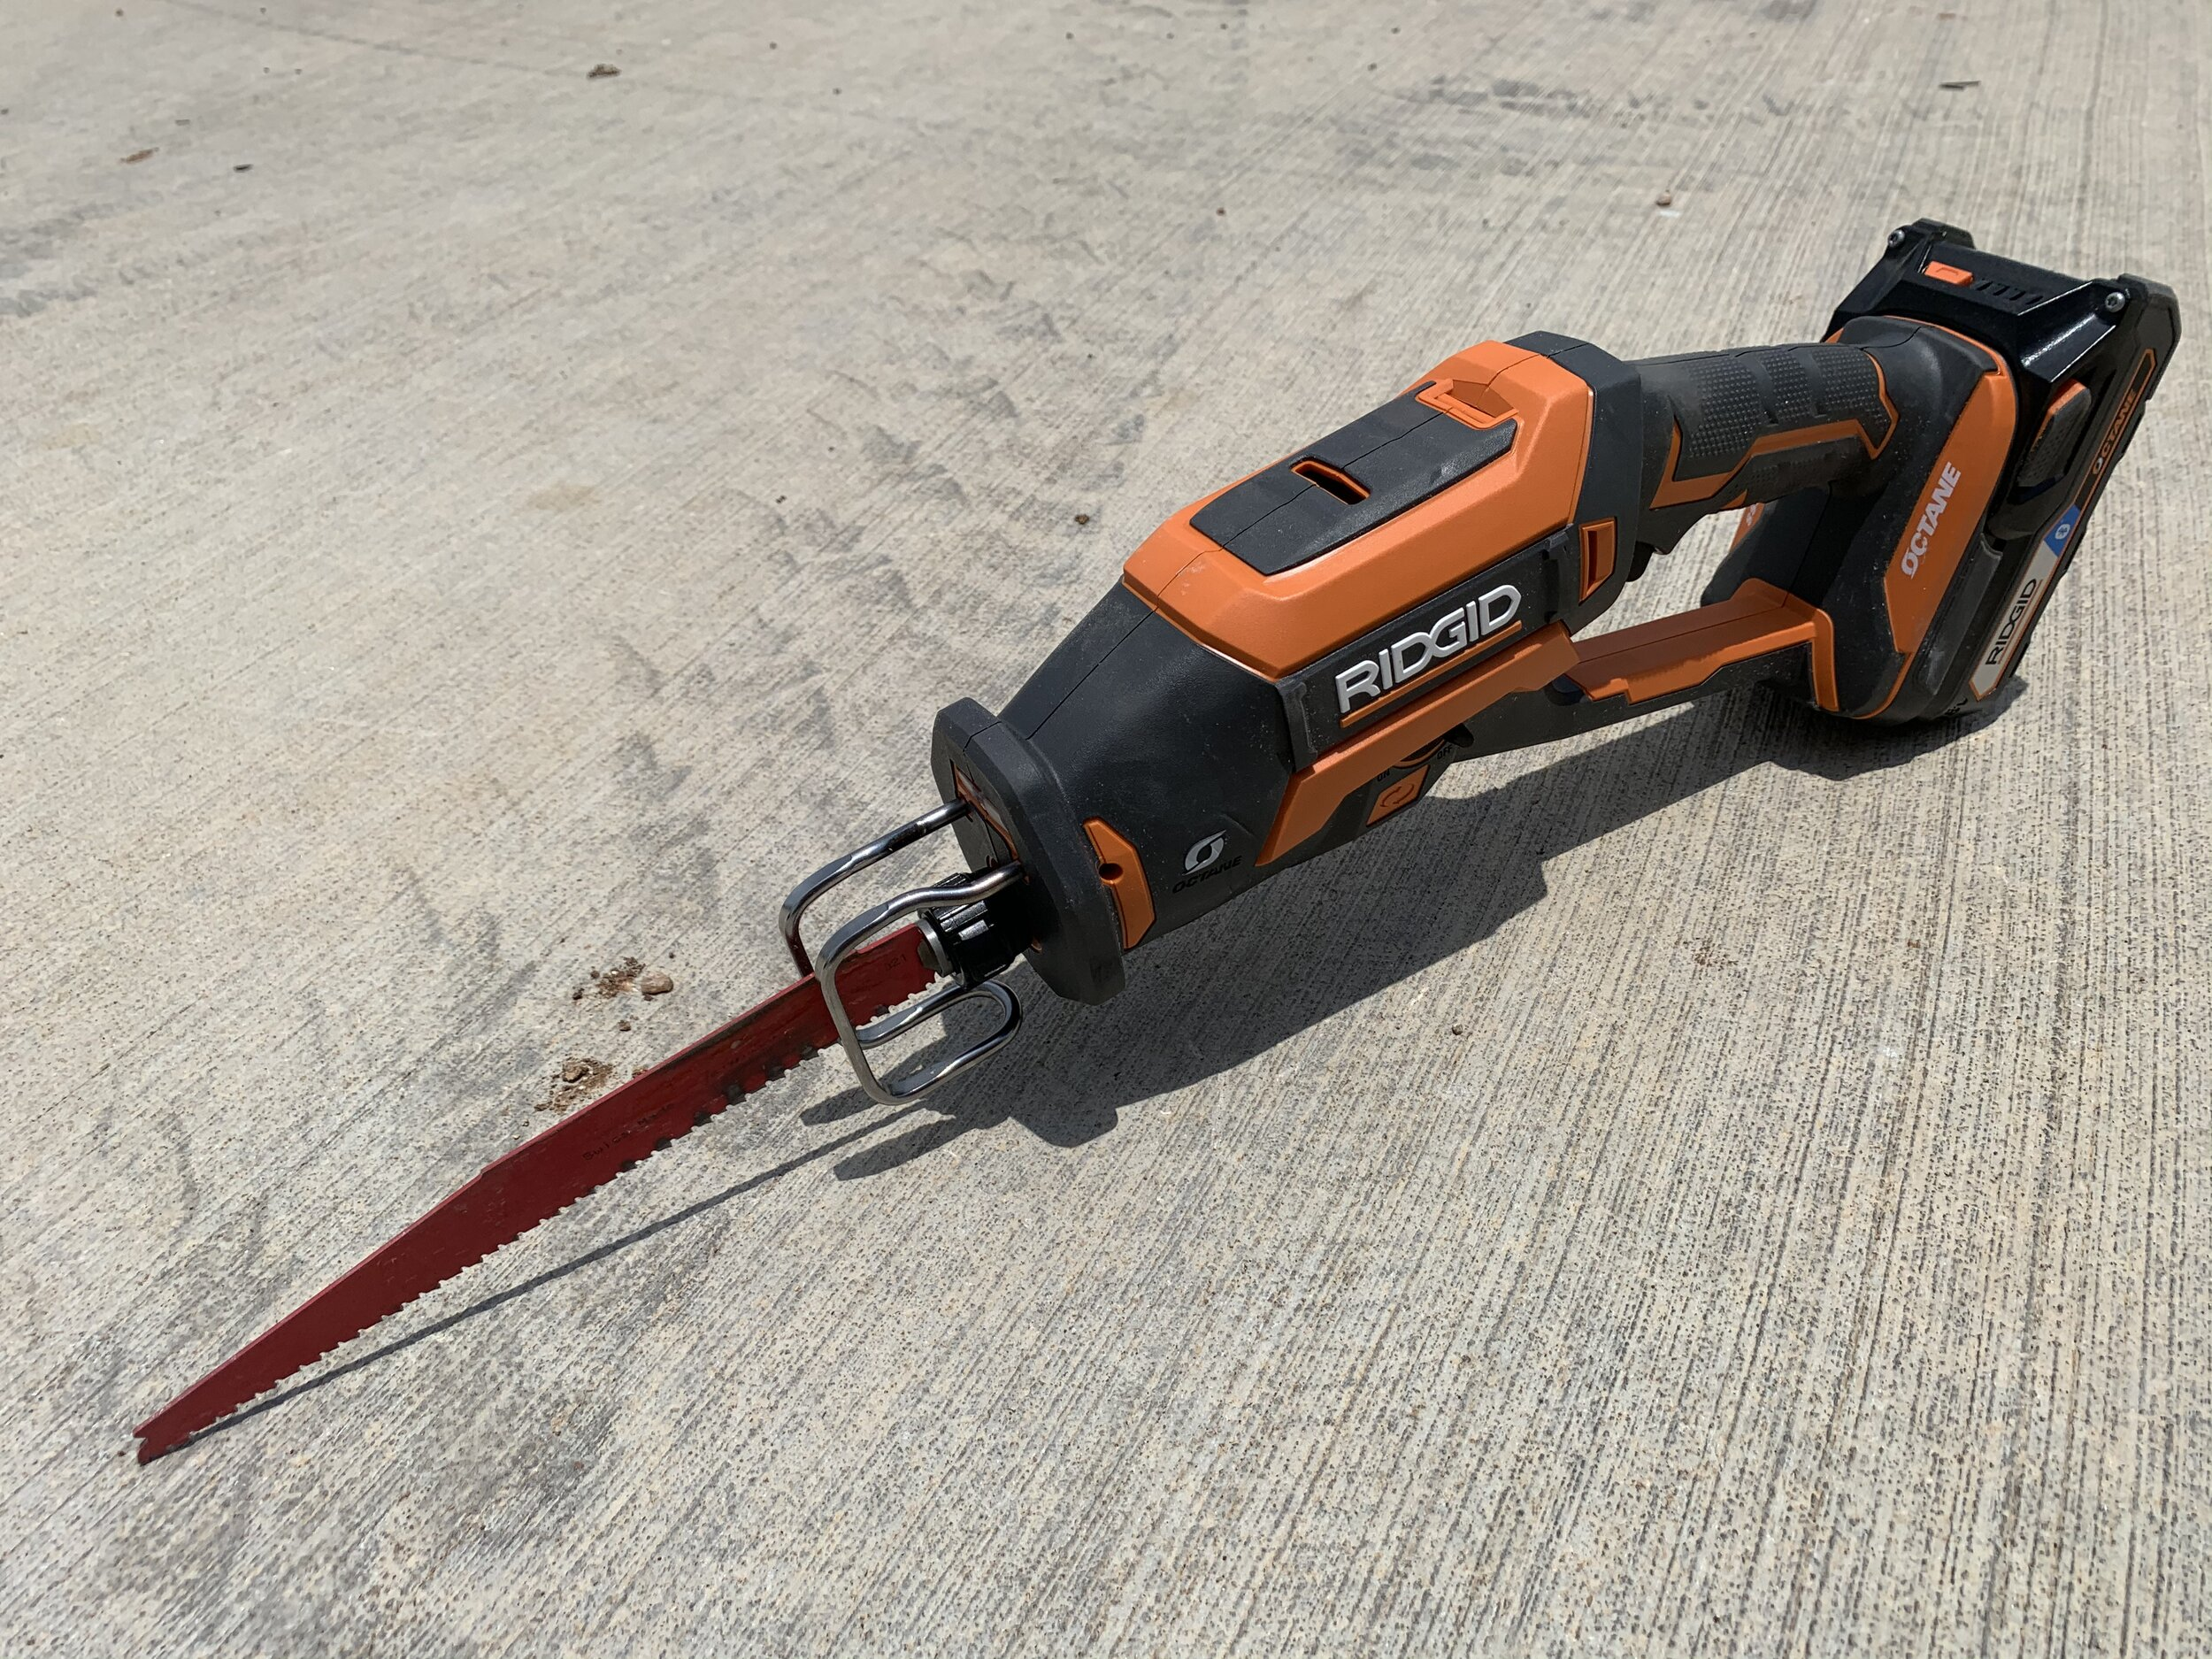 ridgid-one-handed-reciprocating-saw.jpg